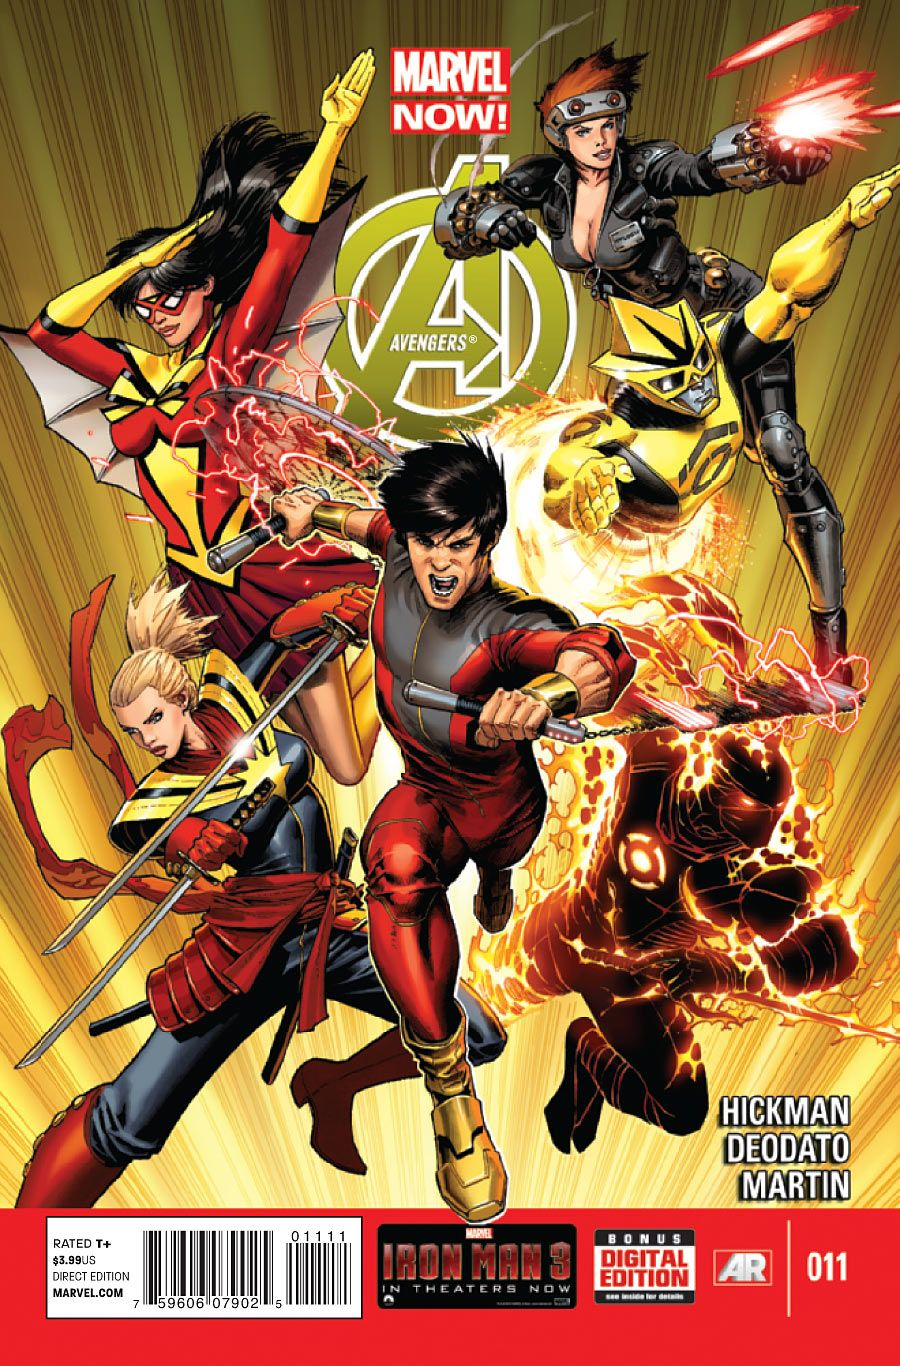 shang chi secret avengers - Google Search | Avengers, Spider woman, Secret  avengers